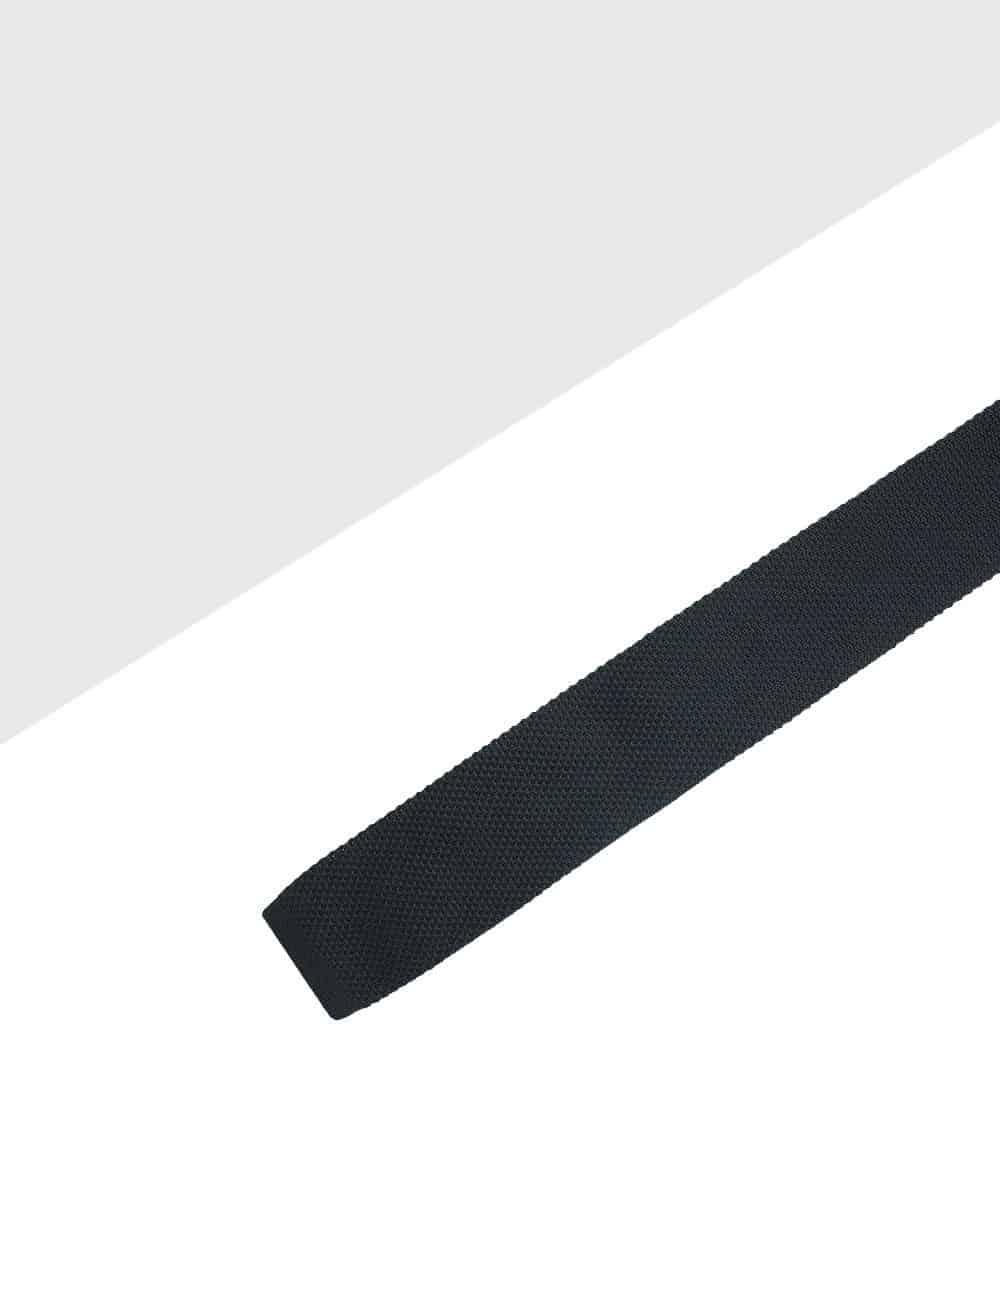 Solid Black Knitted Necktie KNT70.8